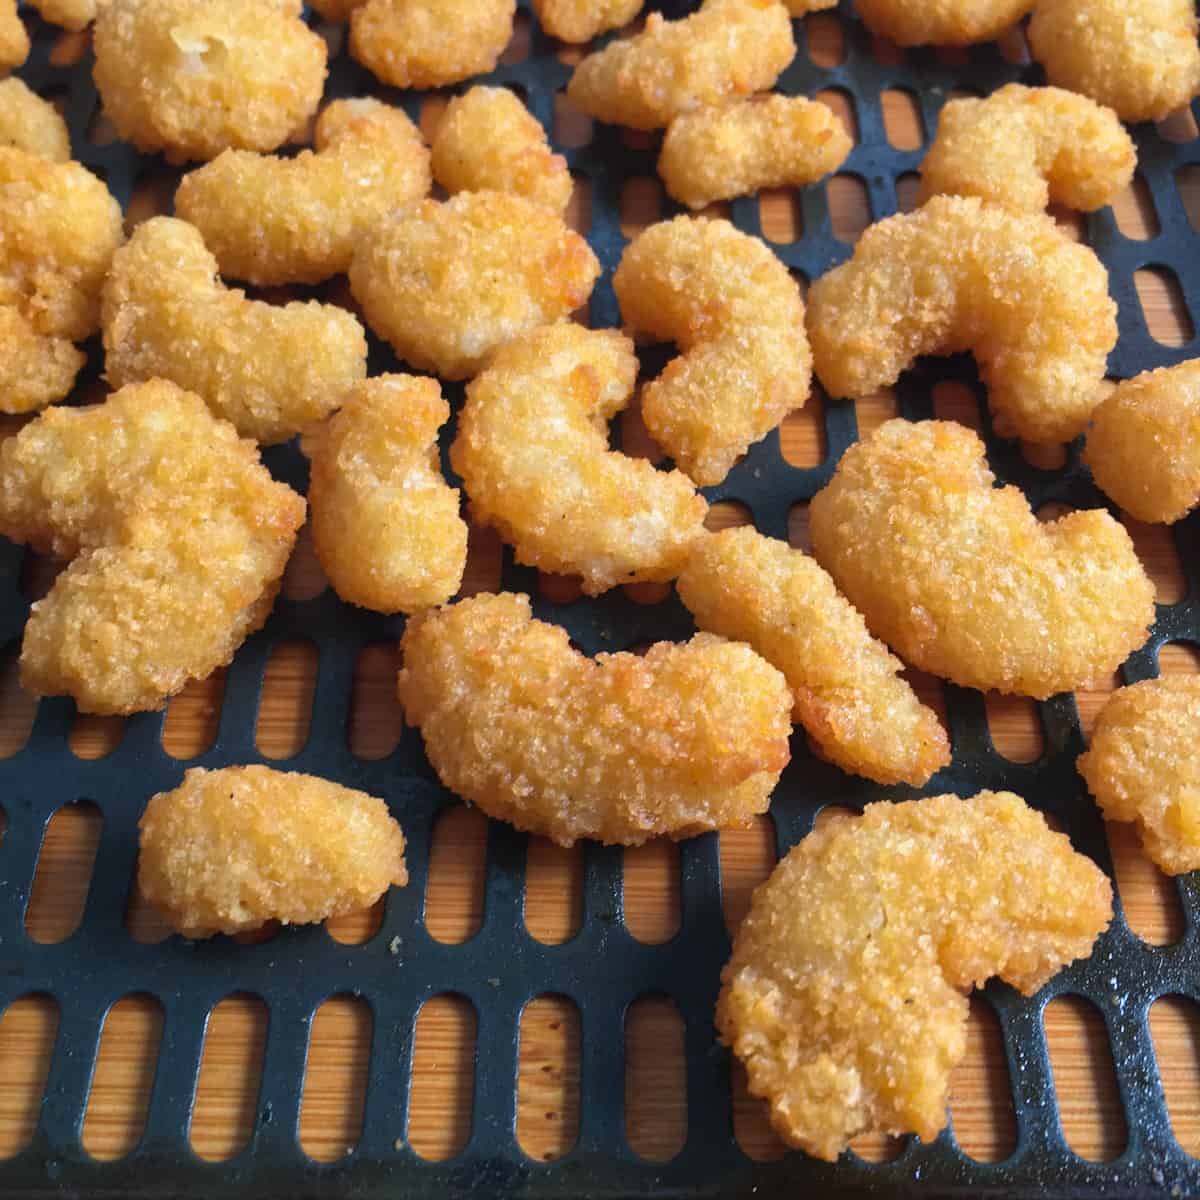 popcorn shrimp in air fryer